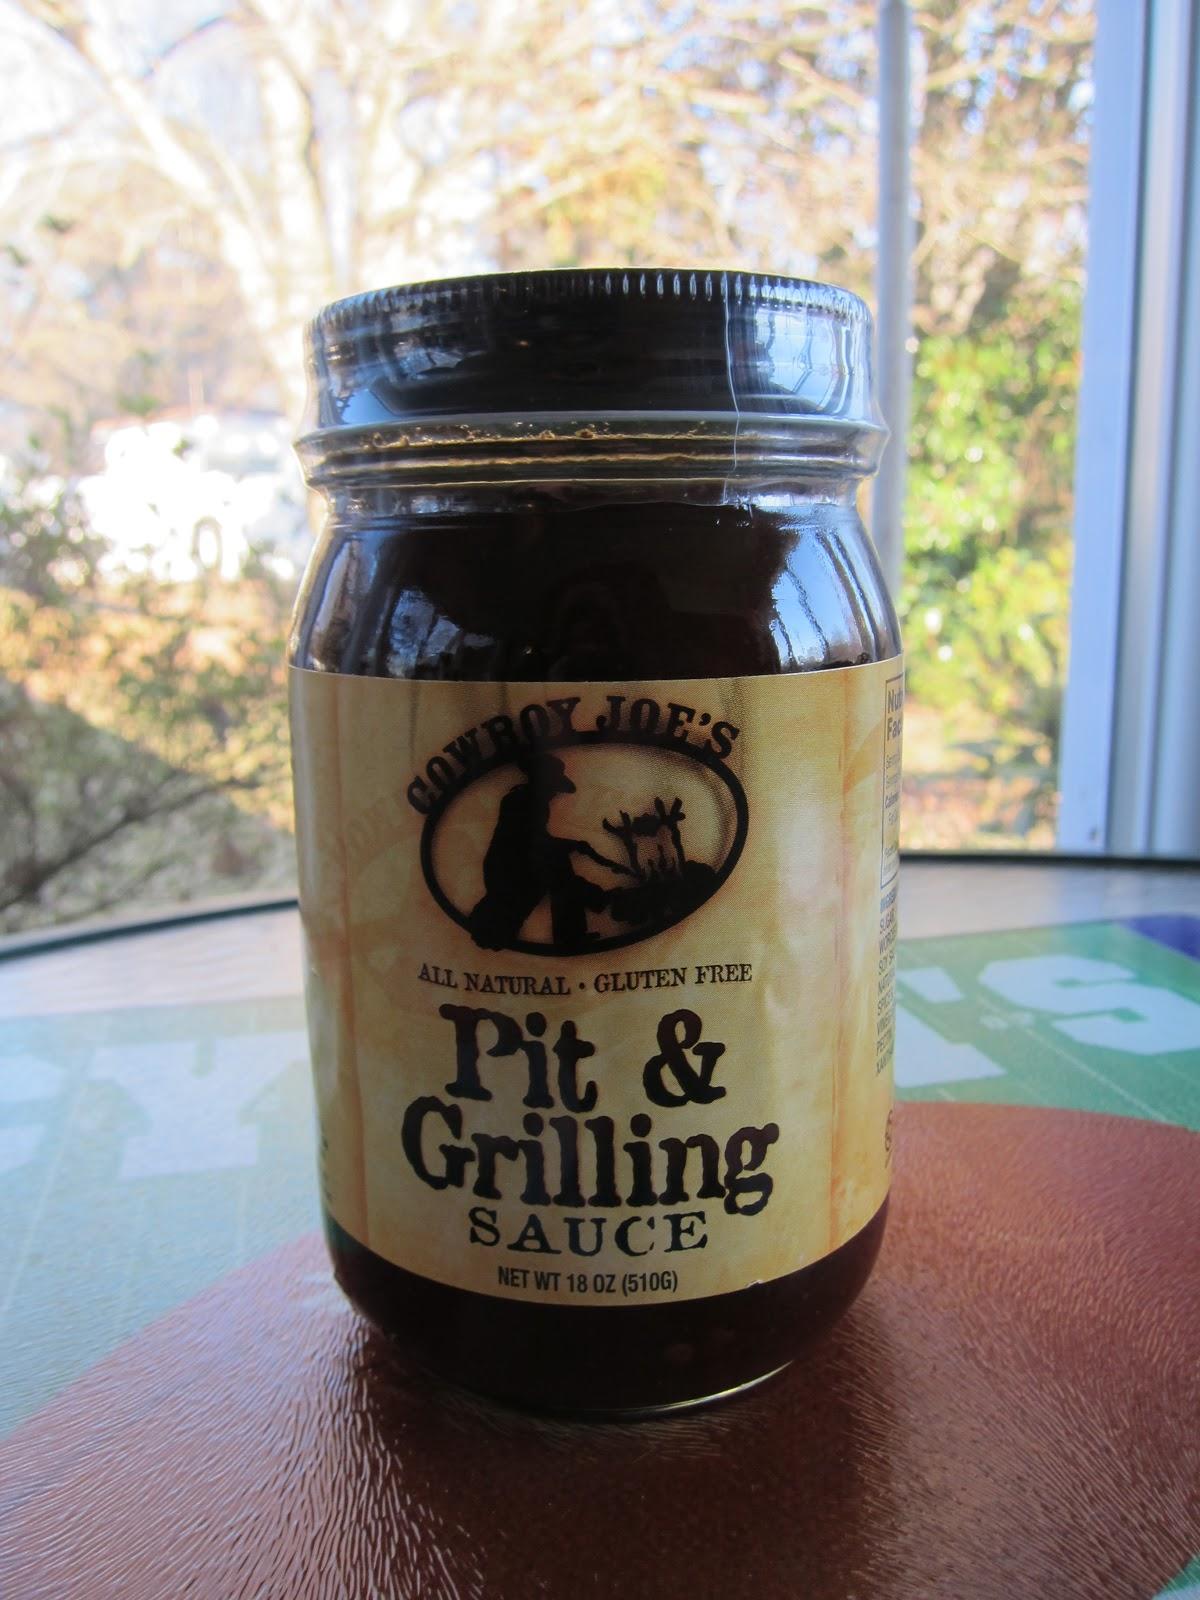 ... Master: Cowboy Joe's Pit and Grilling Sauce - Vinegar Sauce Review